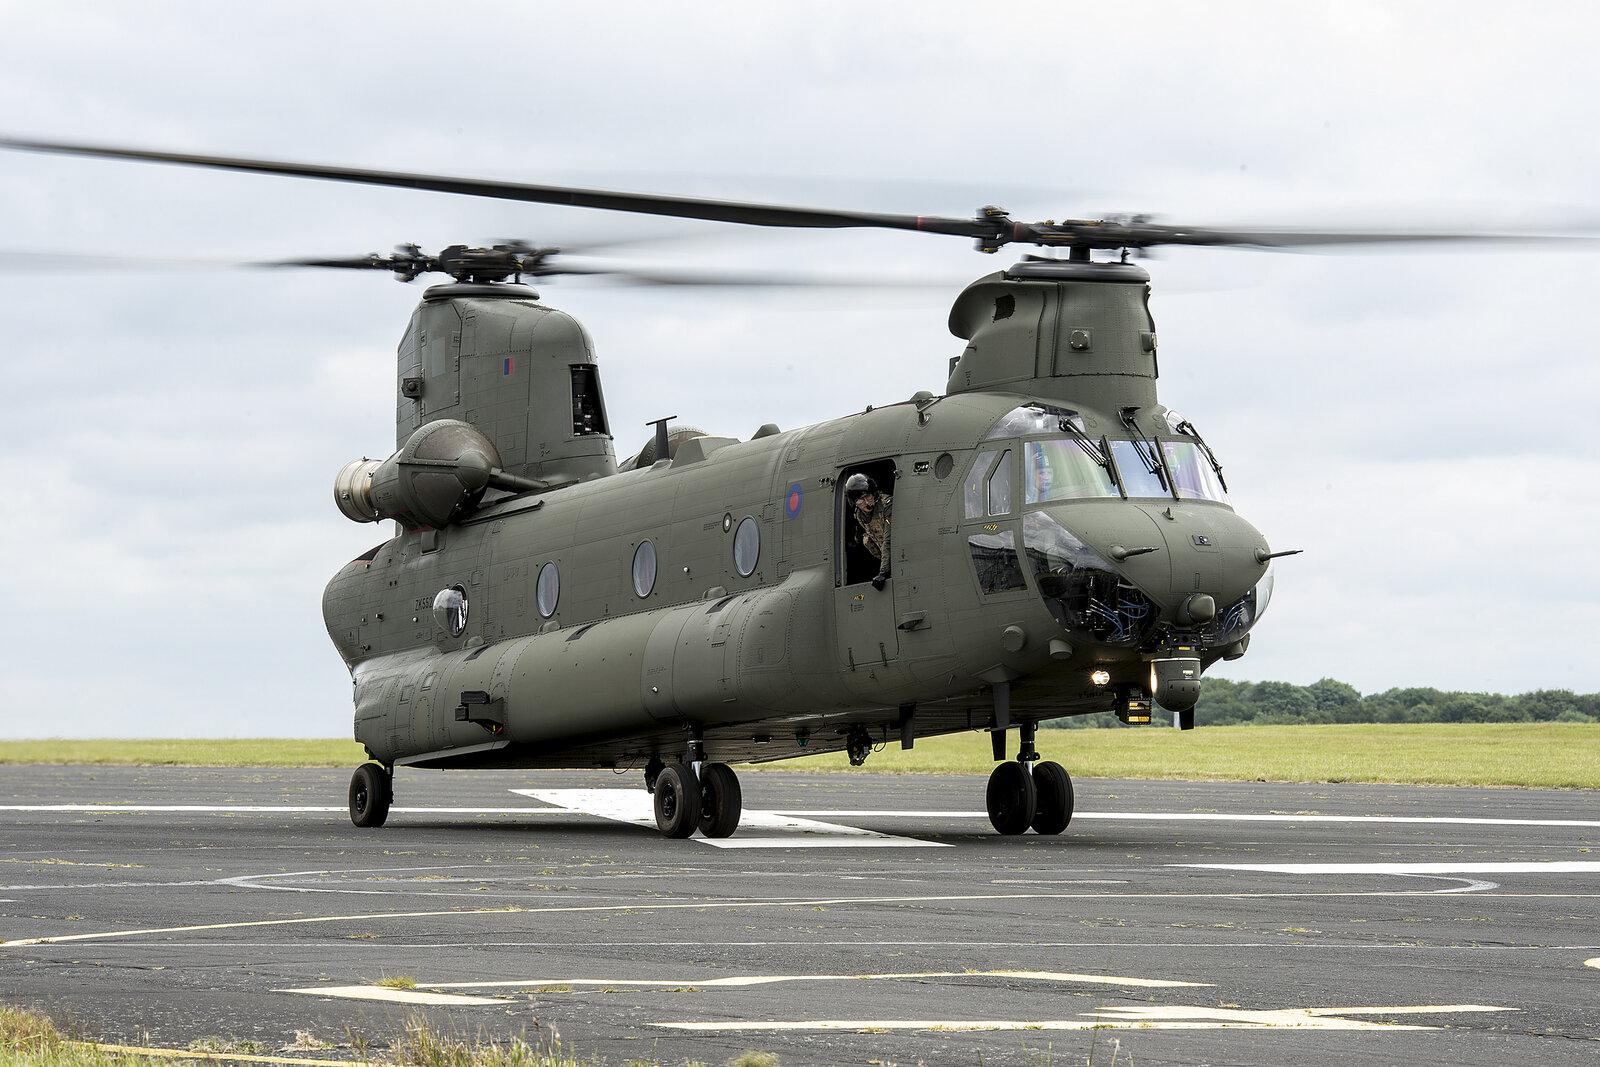 RAF_Chinook_Mark_6_Helicopter_MOD_45158788.jpg